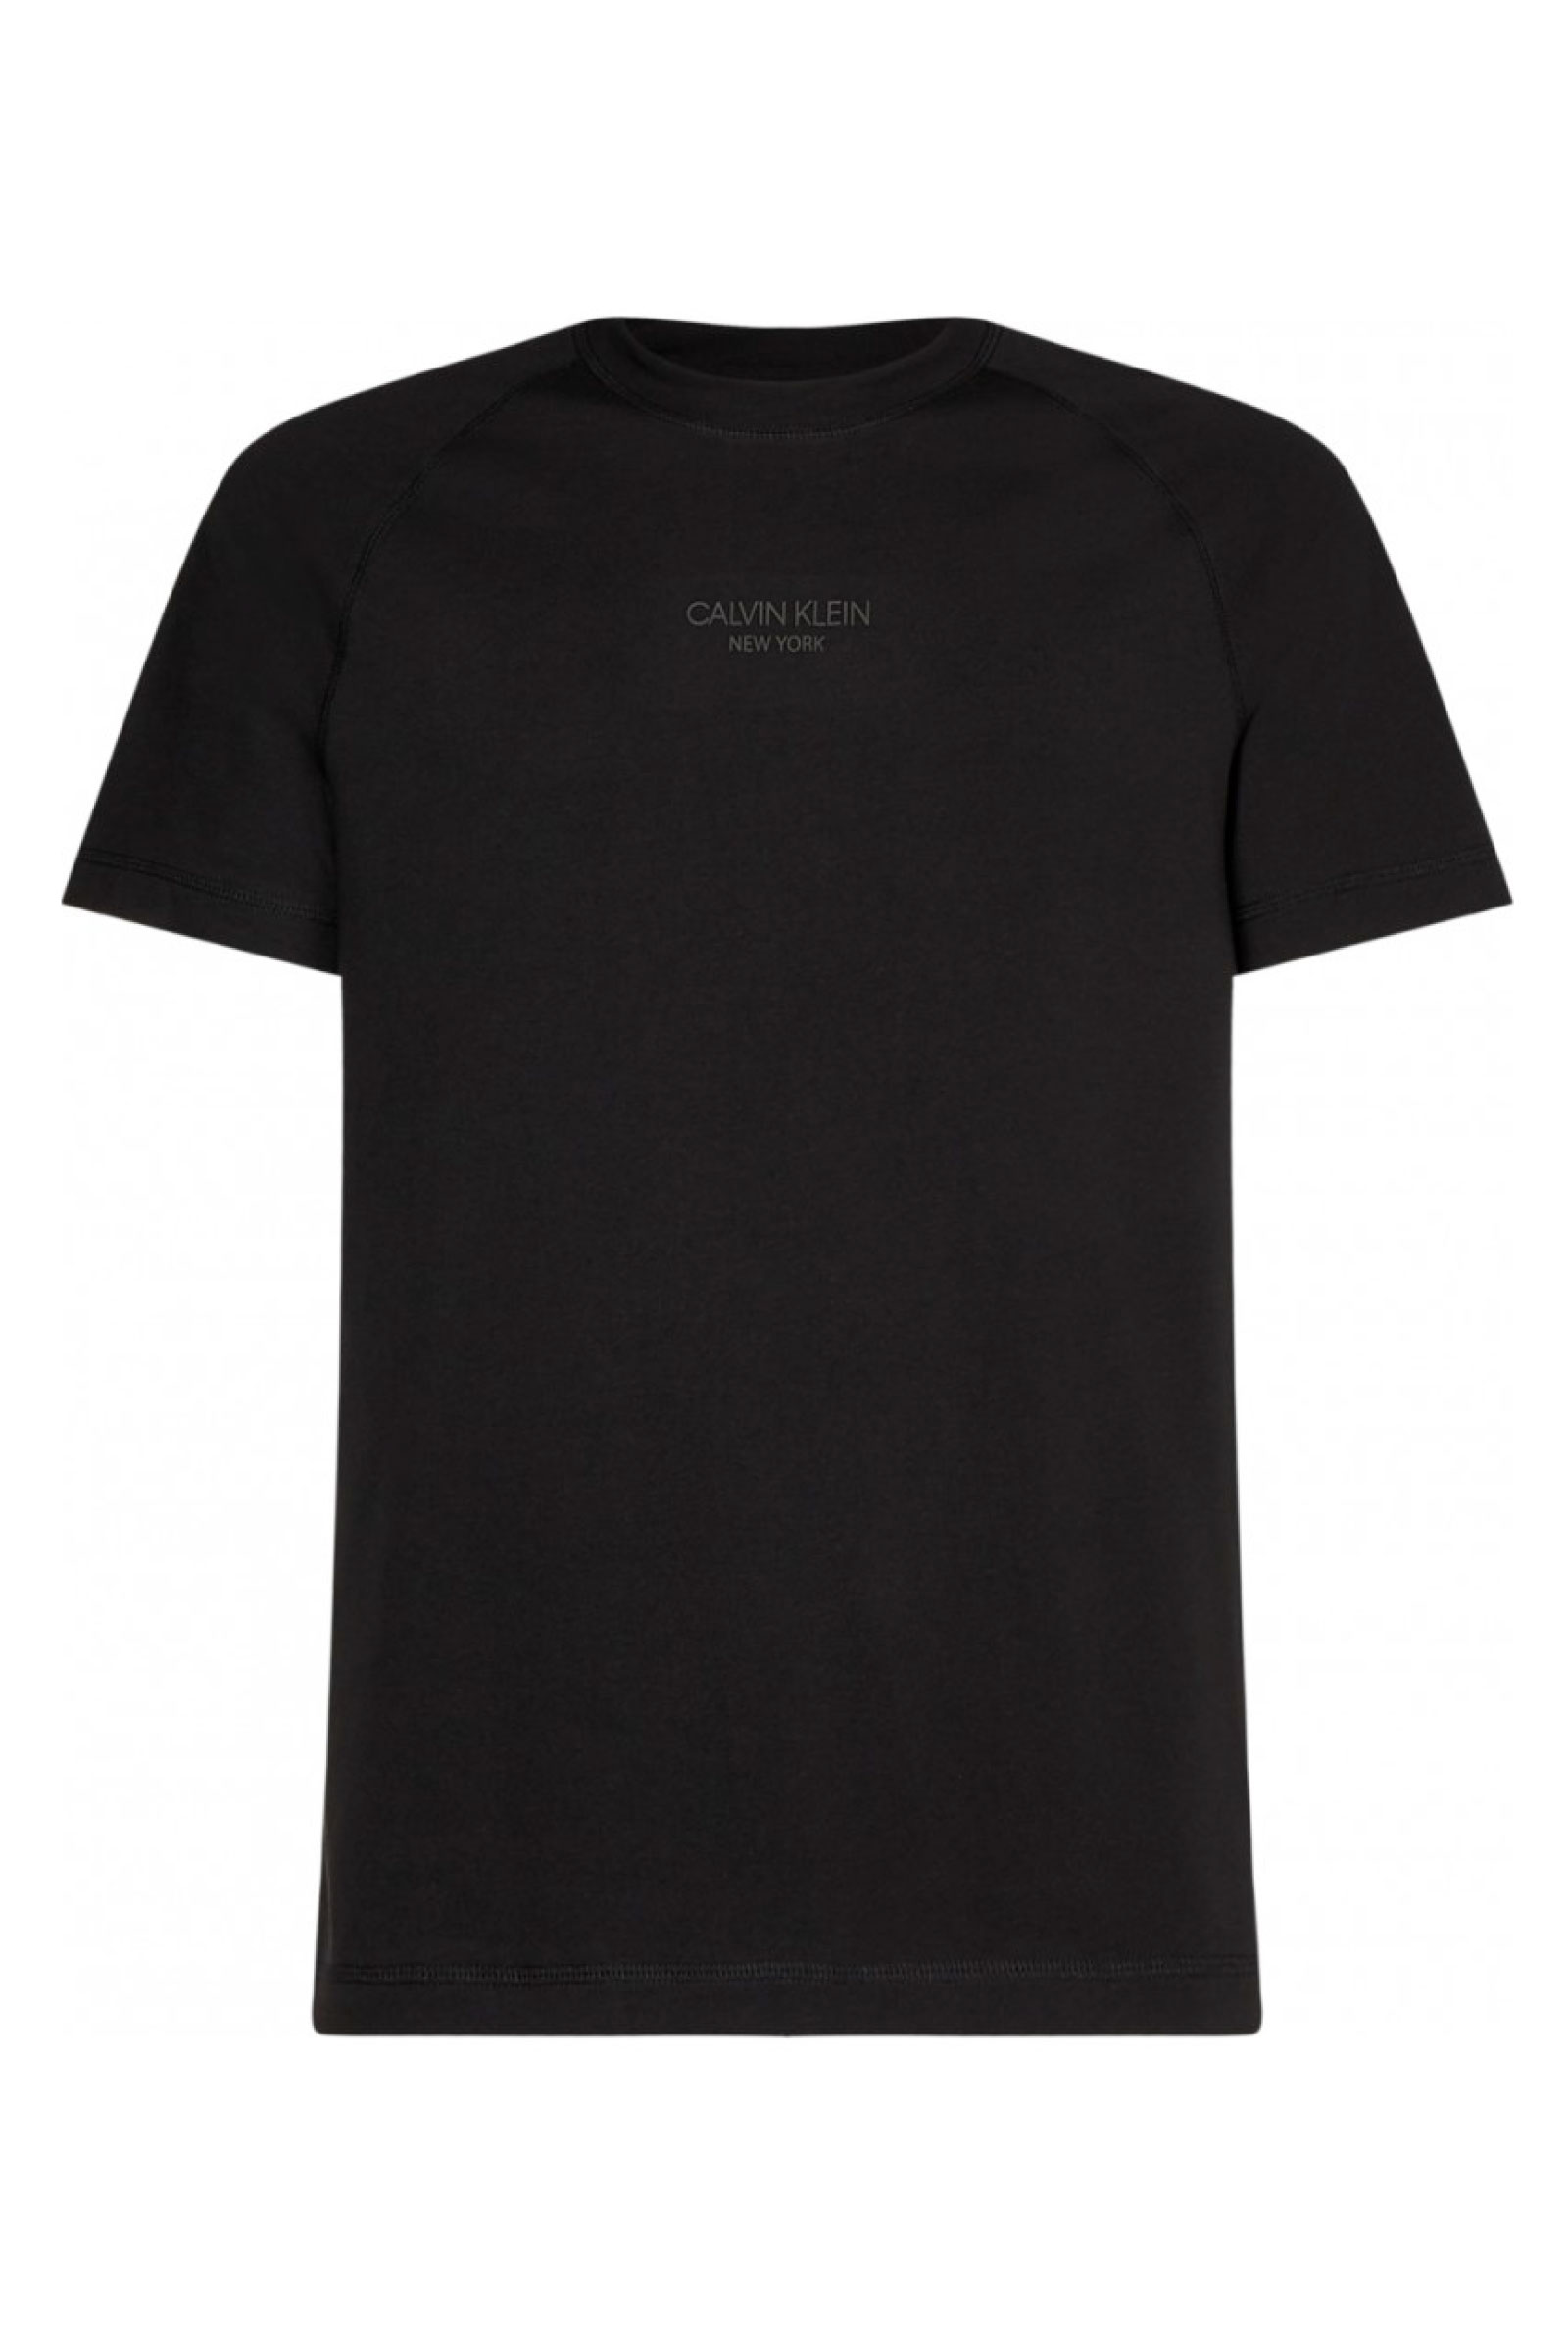 CALVIN KLEIN Men's T-Shirt CALVIN KLEIN | T-Shirt | K10K106498BEH